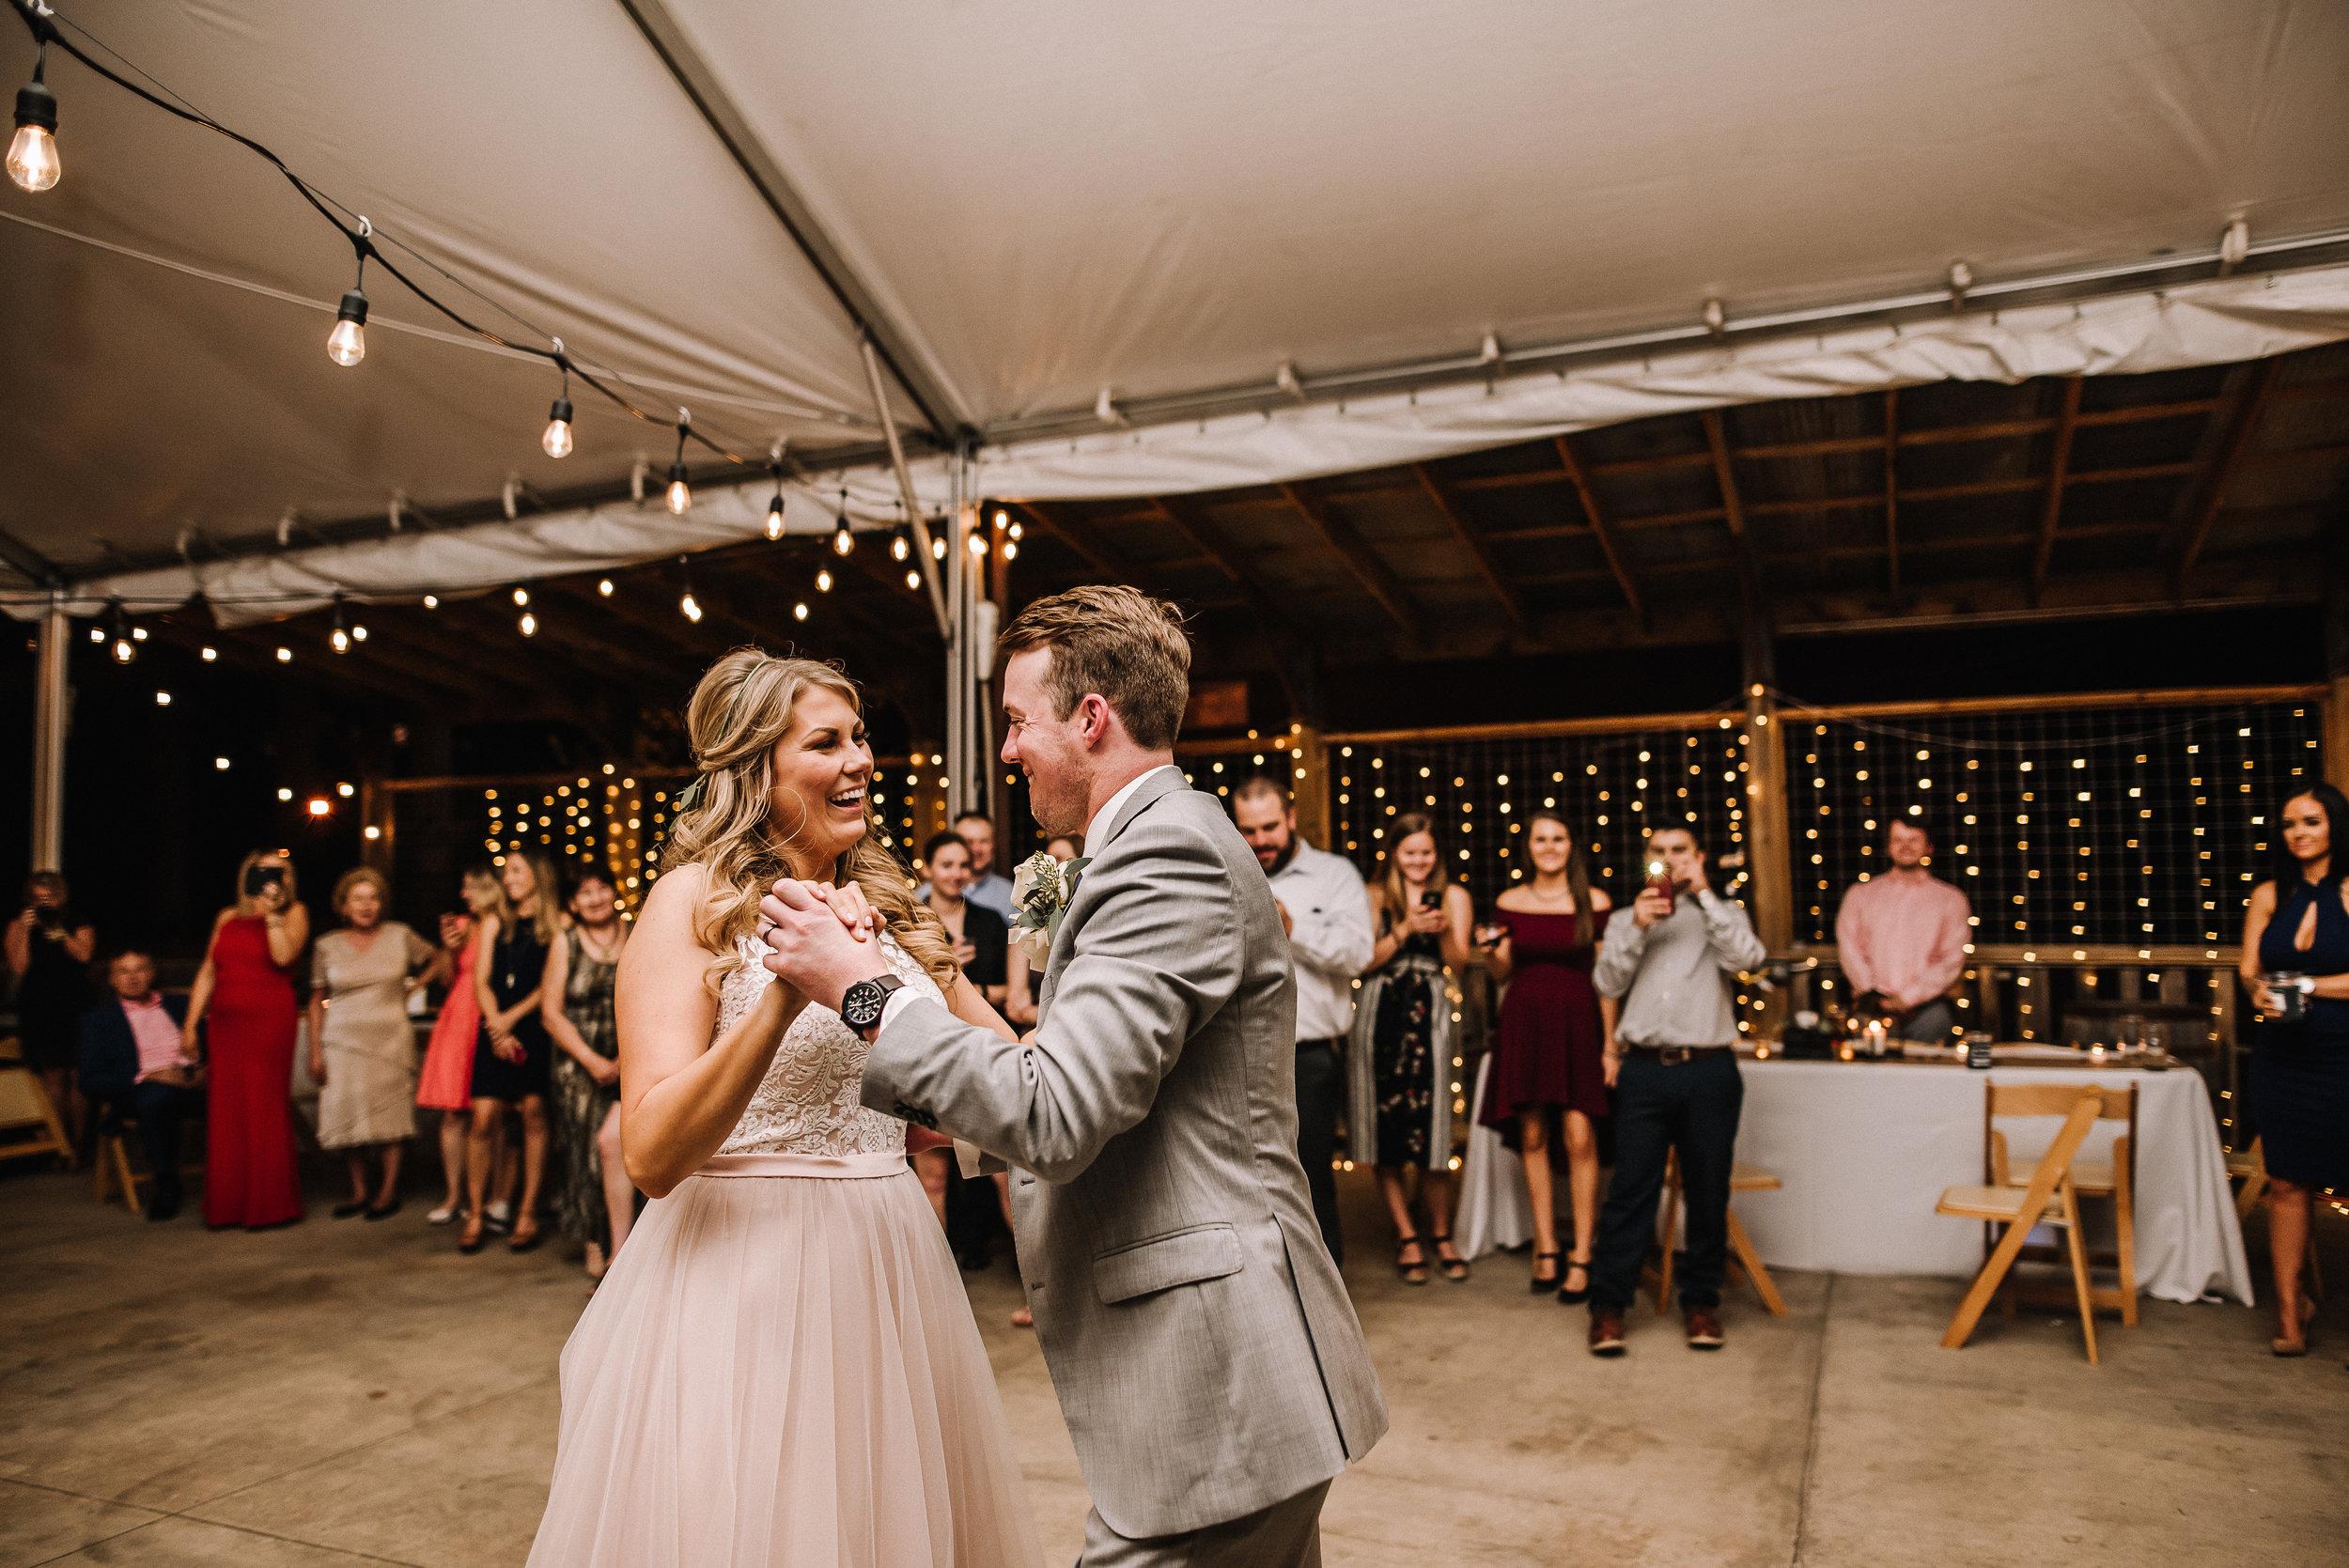 Pearson-Wiseacre-Wedding_Ashley-Benham-Photography (402 of 633).jpg